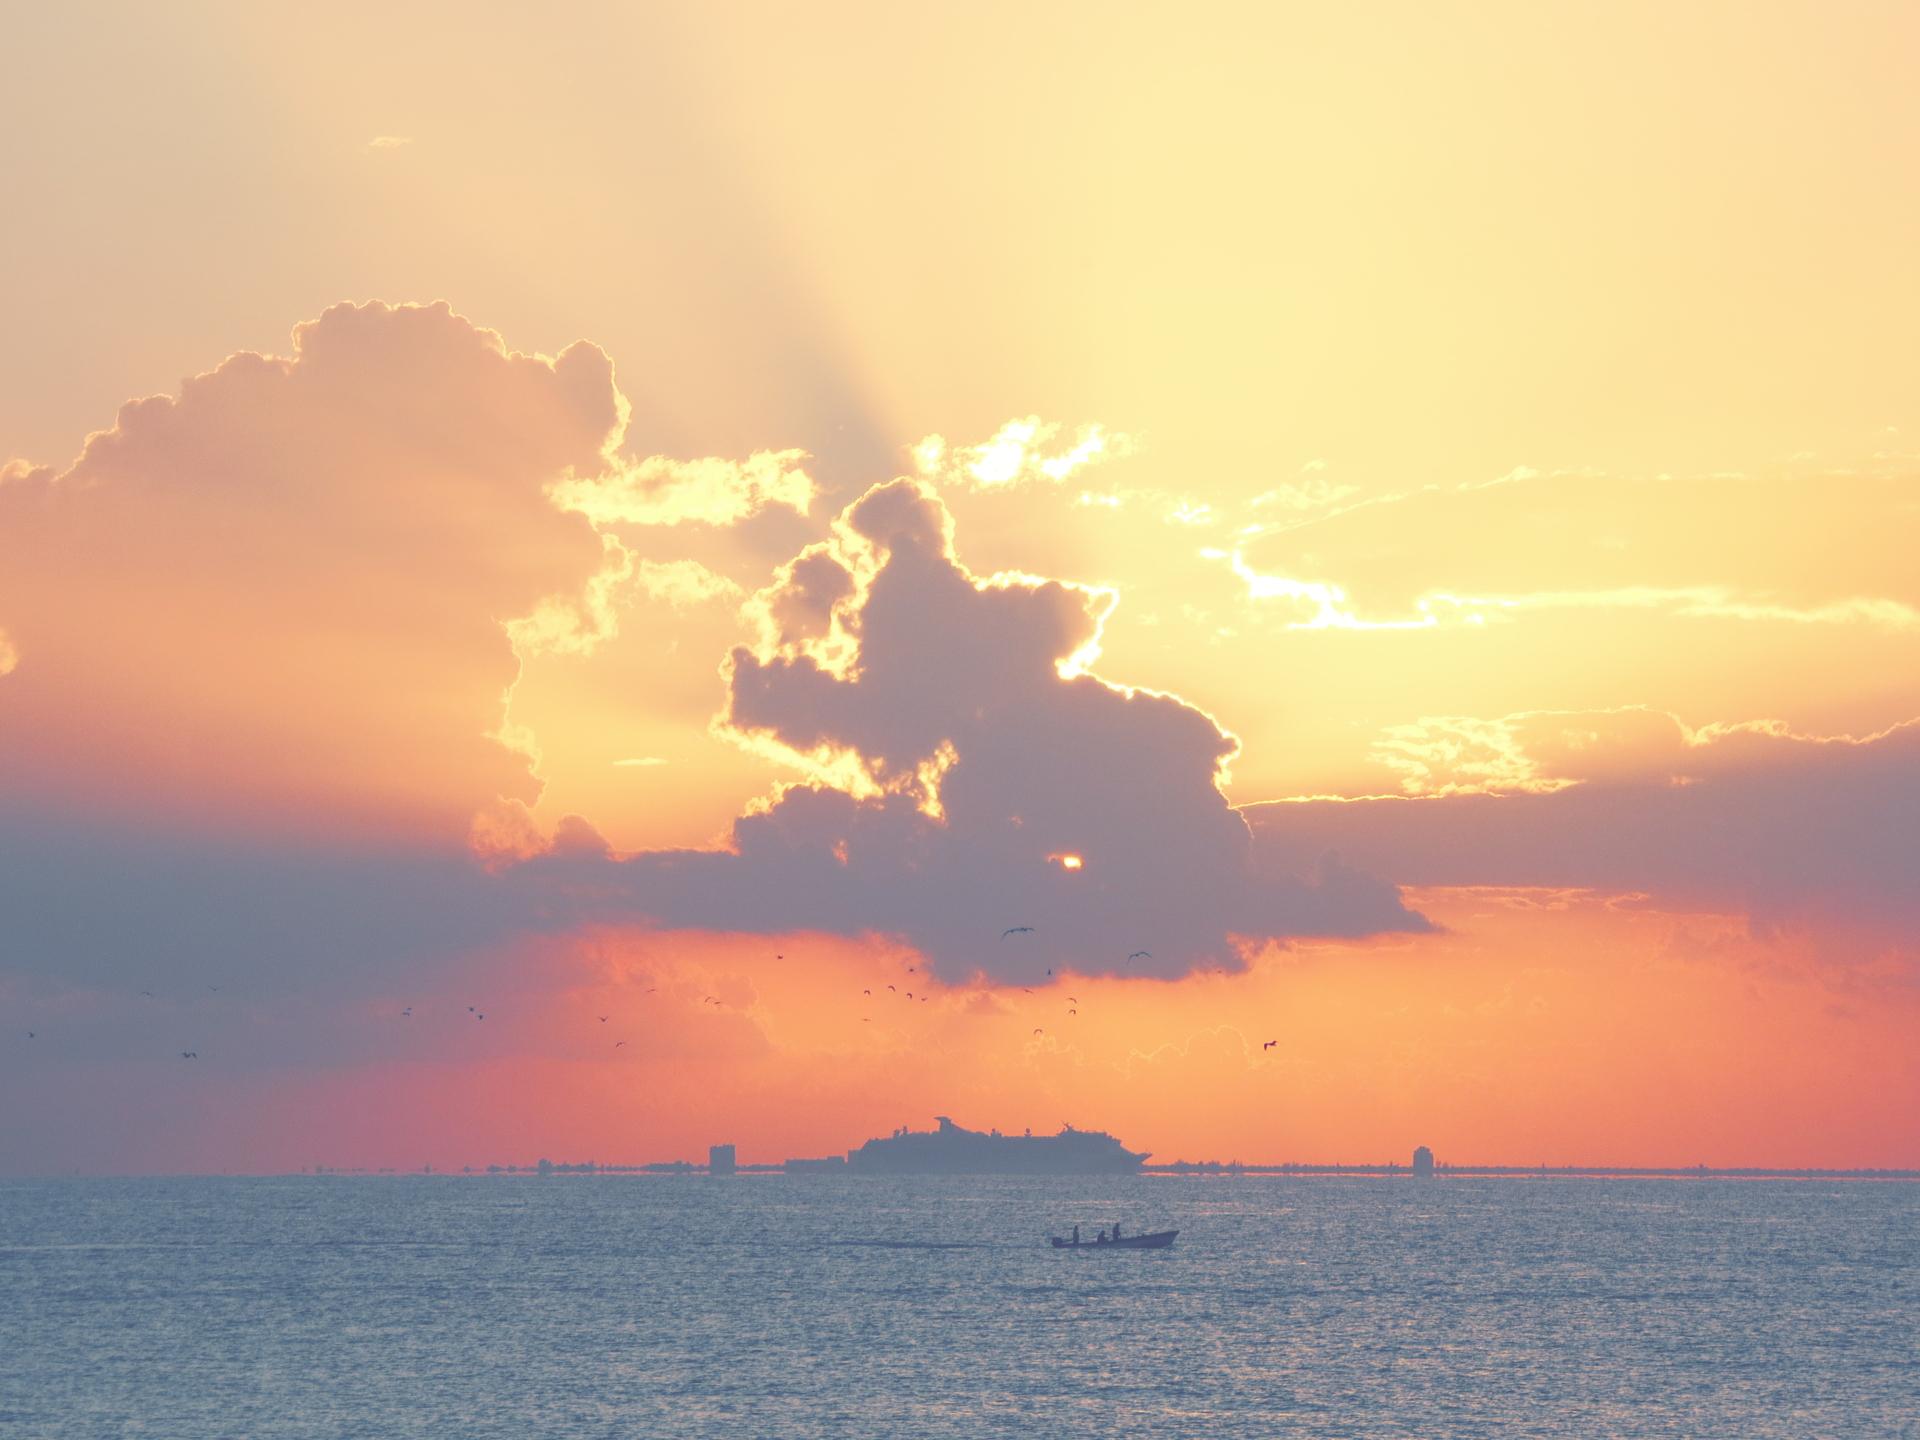 mexiko playa del carmen sonnenaufgang richtung cozumel